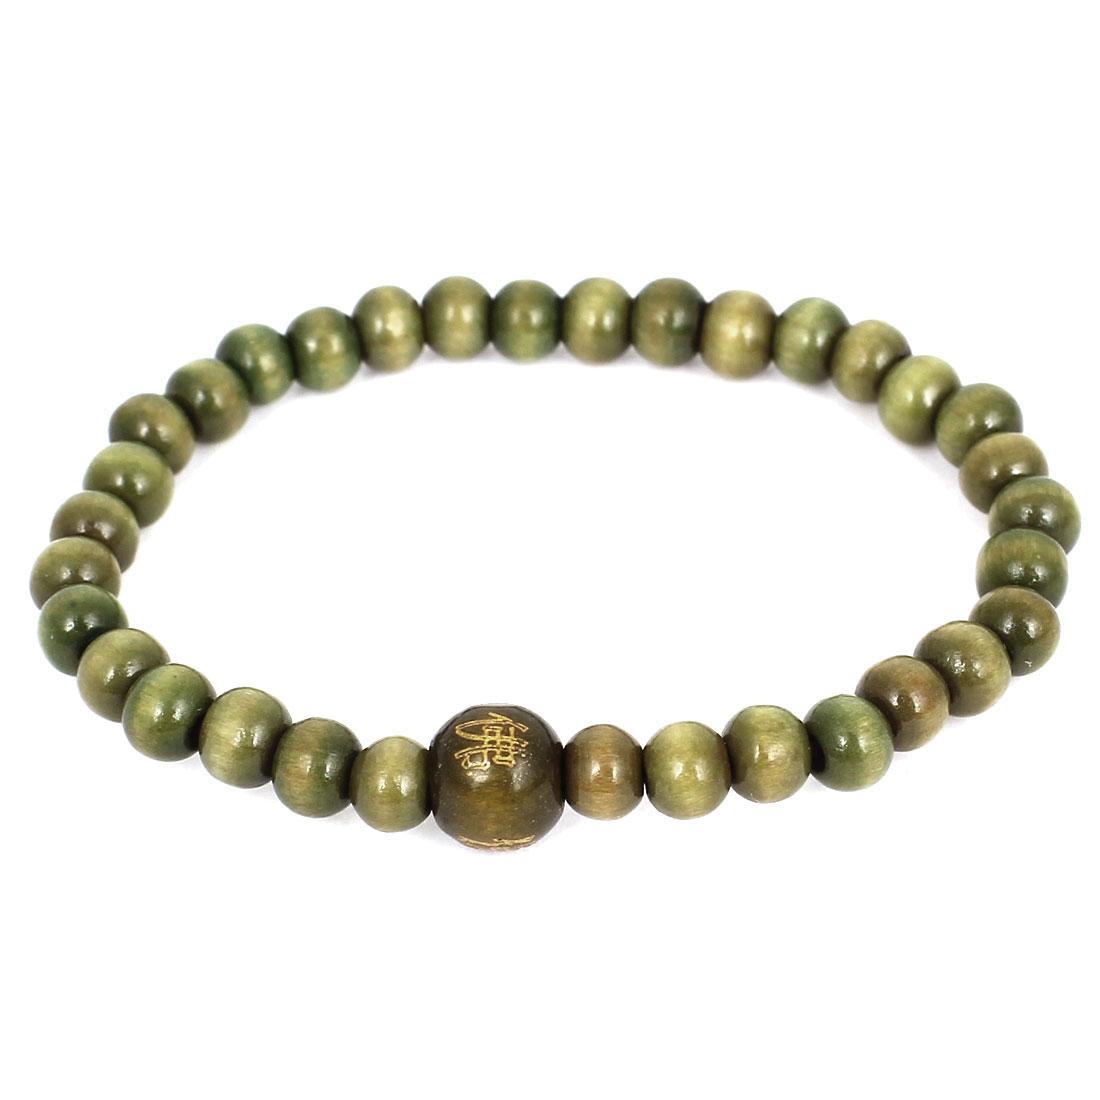 Unisex Plastic Round Buddha Beads Elastic Wrist Prayer Bracelet Olive Green